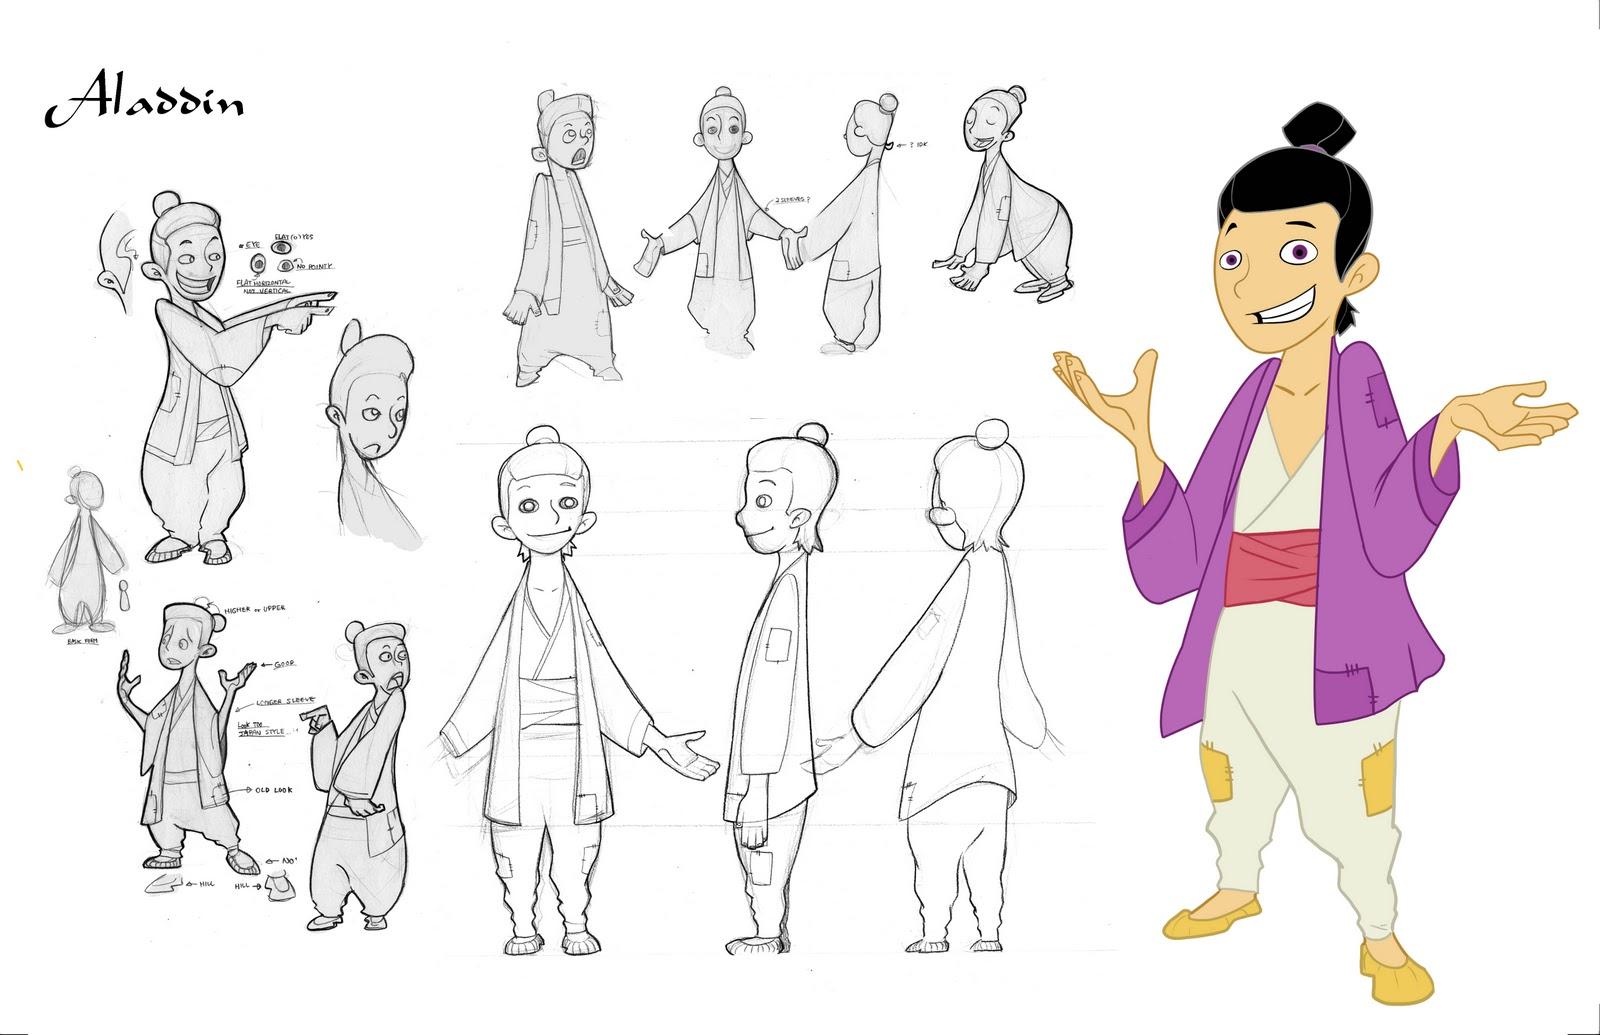 Disney Character Design Internship : Jin choi character project aladin